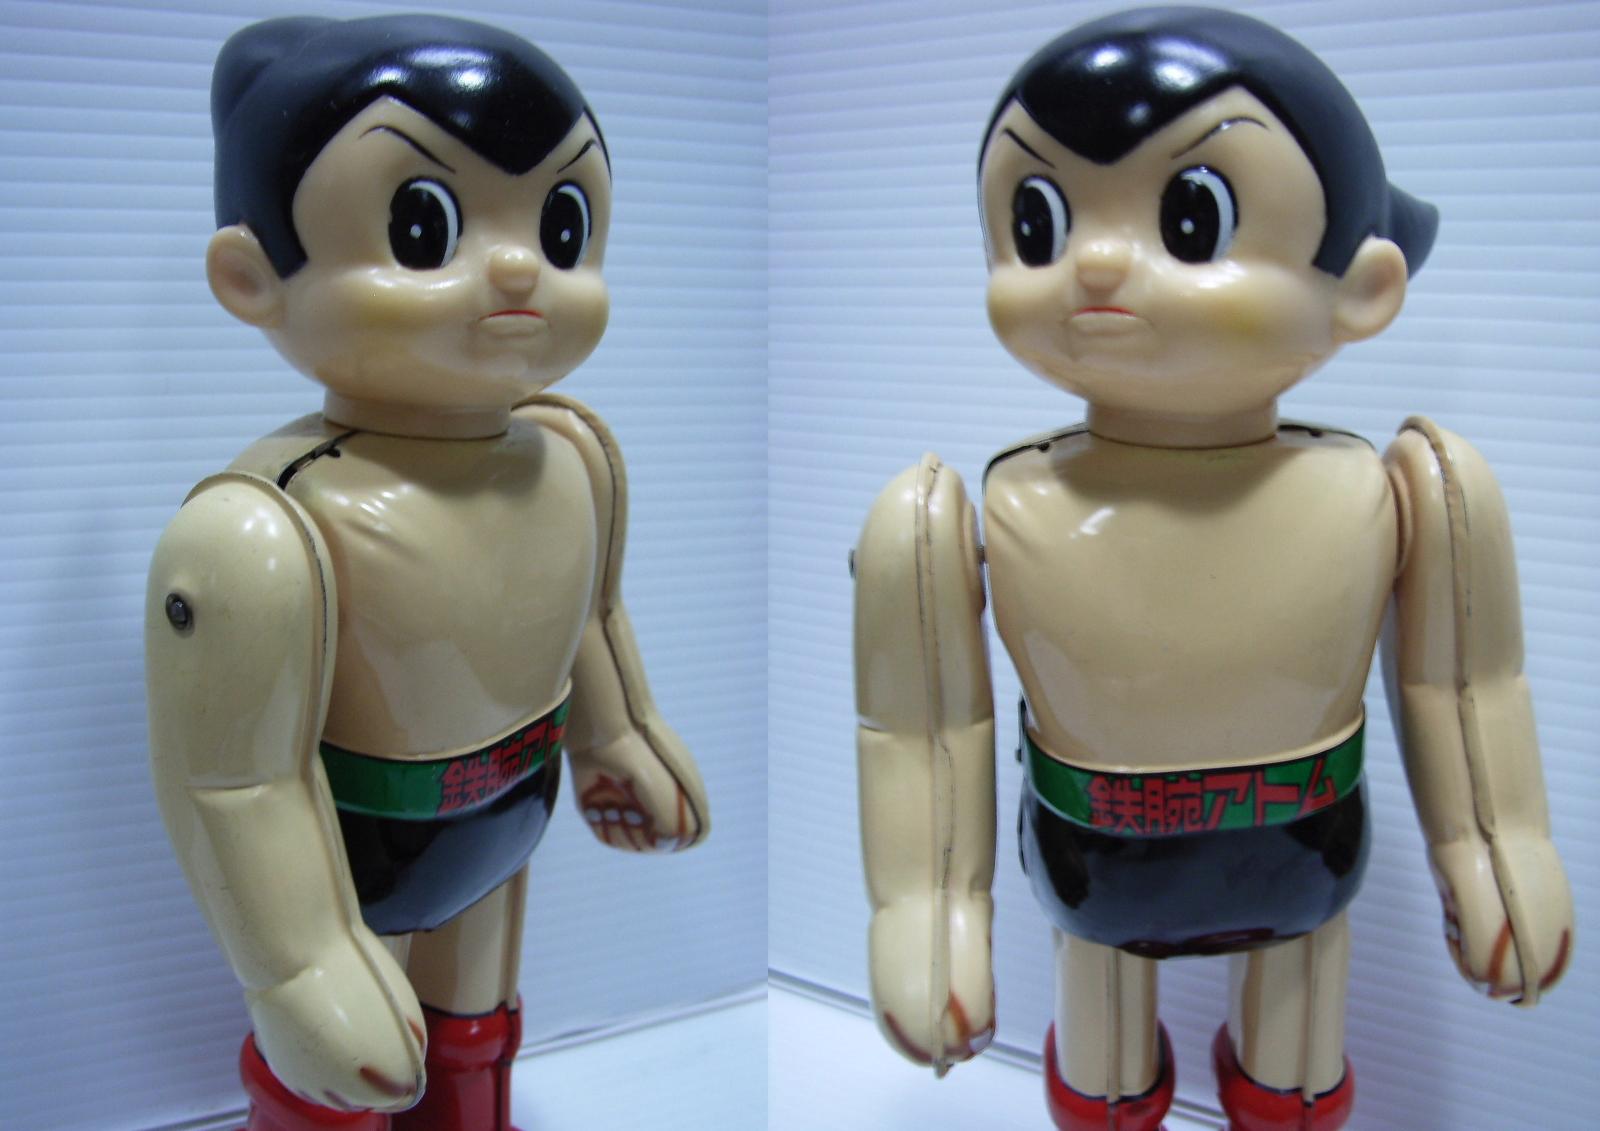 NTT サンクスフェア 鉄腕アトム ブリキ ロボット 22.4cm 当時物 顔ソフビ 動作確認済 企業物 手塚治虫 現状 【TO2976】